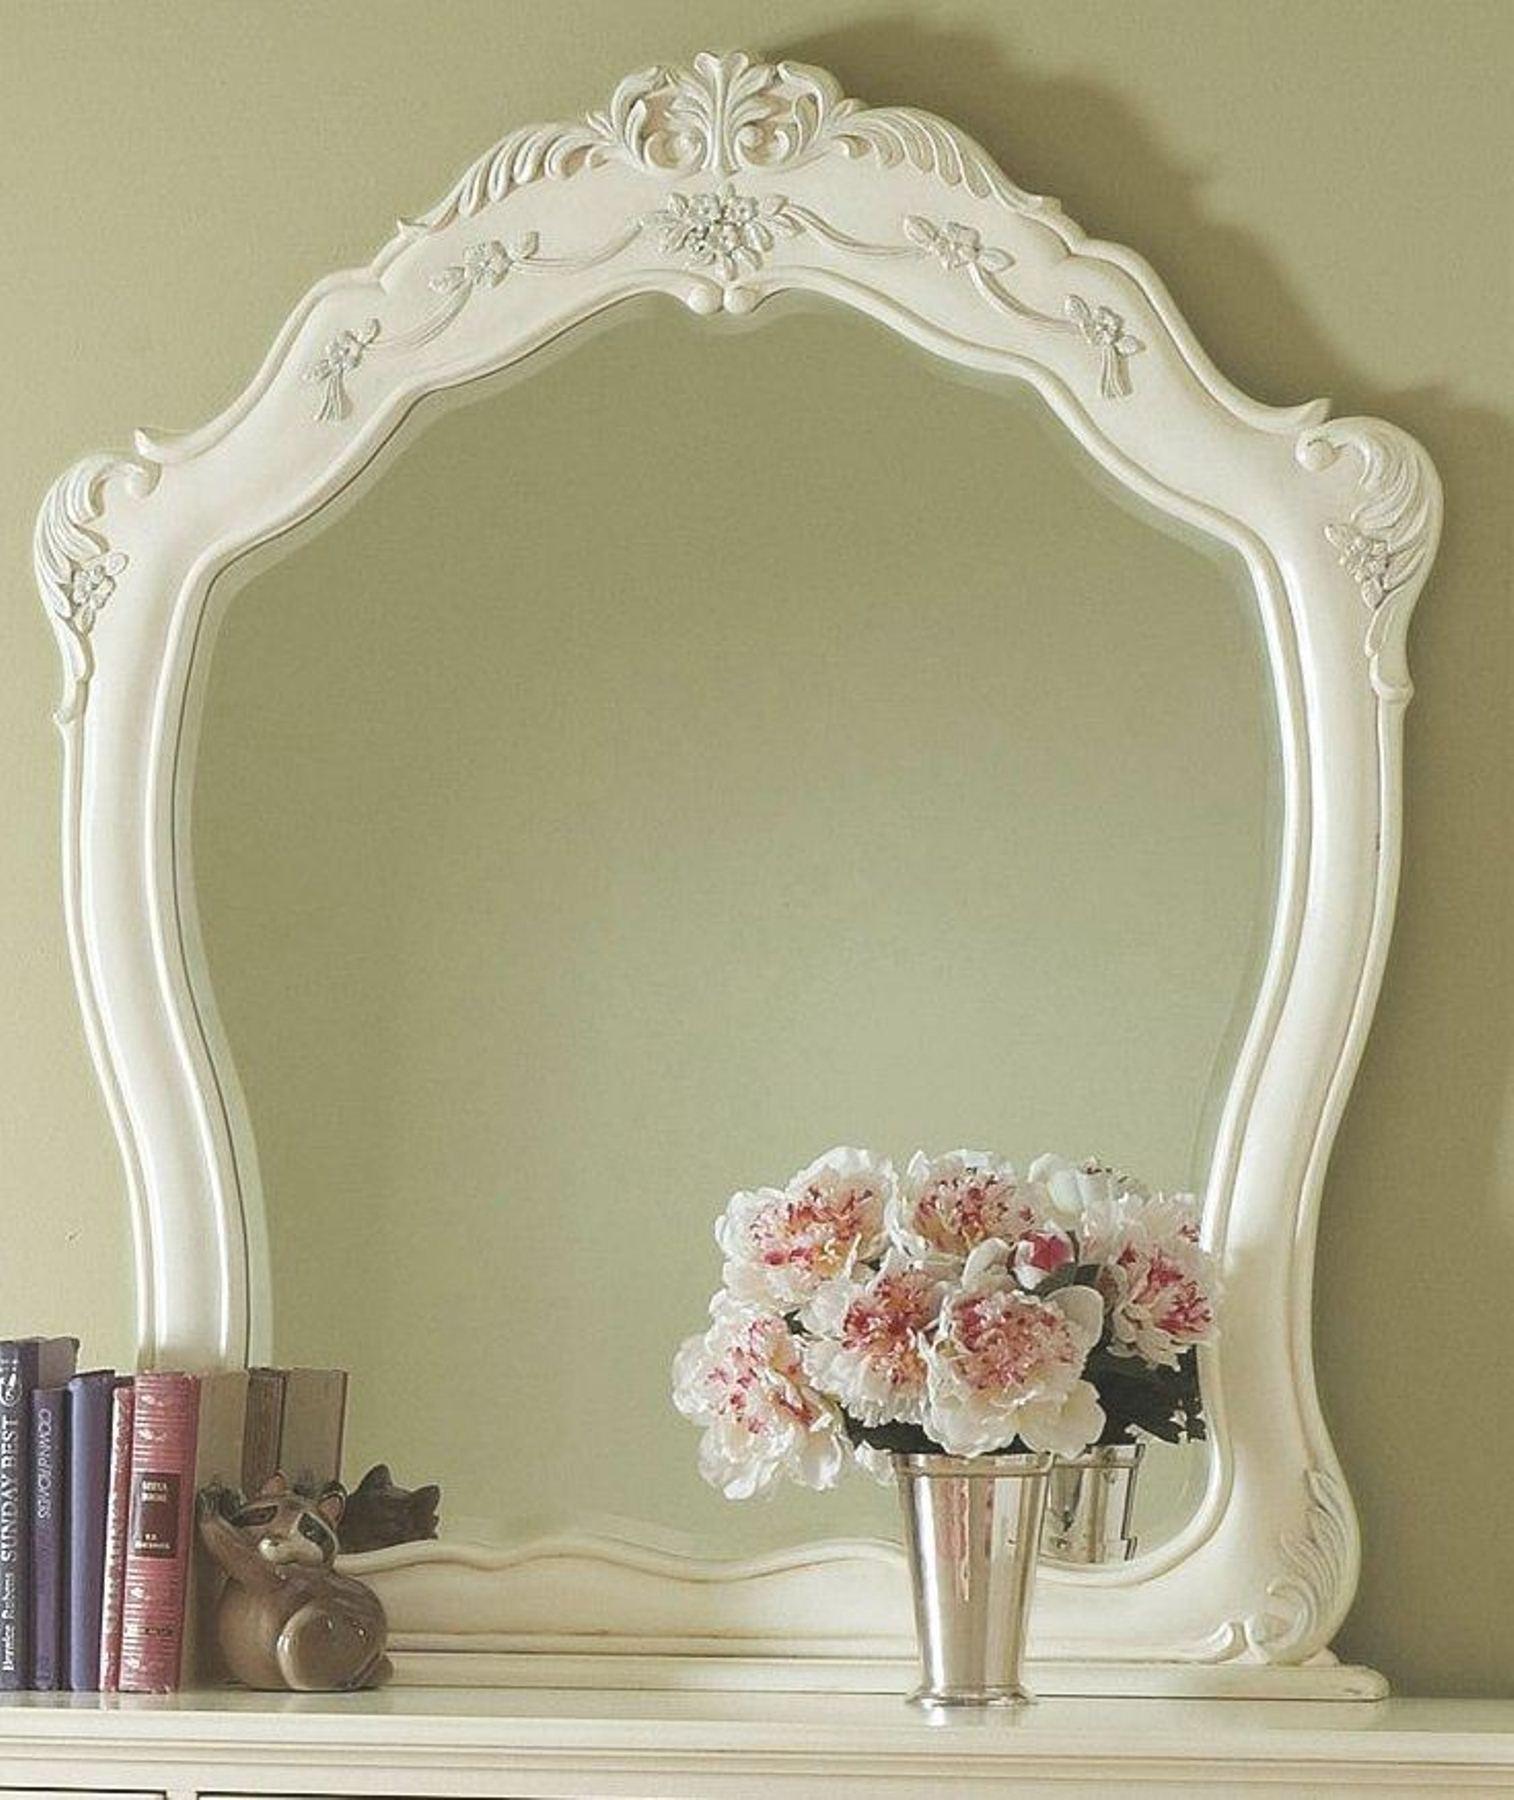 Bedroom Heater Bedroom Sets Mirror Youth Bedroom Sets For Boys Girly Bedroom Door Signs: Cinderella Youth Mirror From Homelegance (1386-6